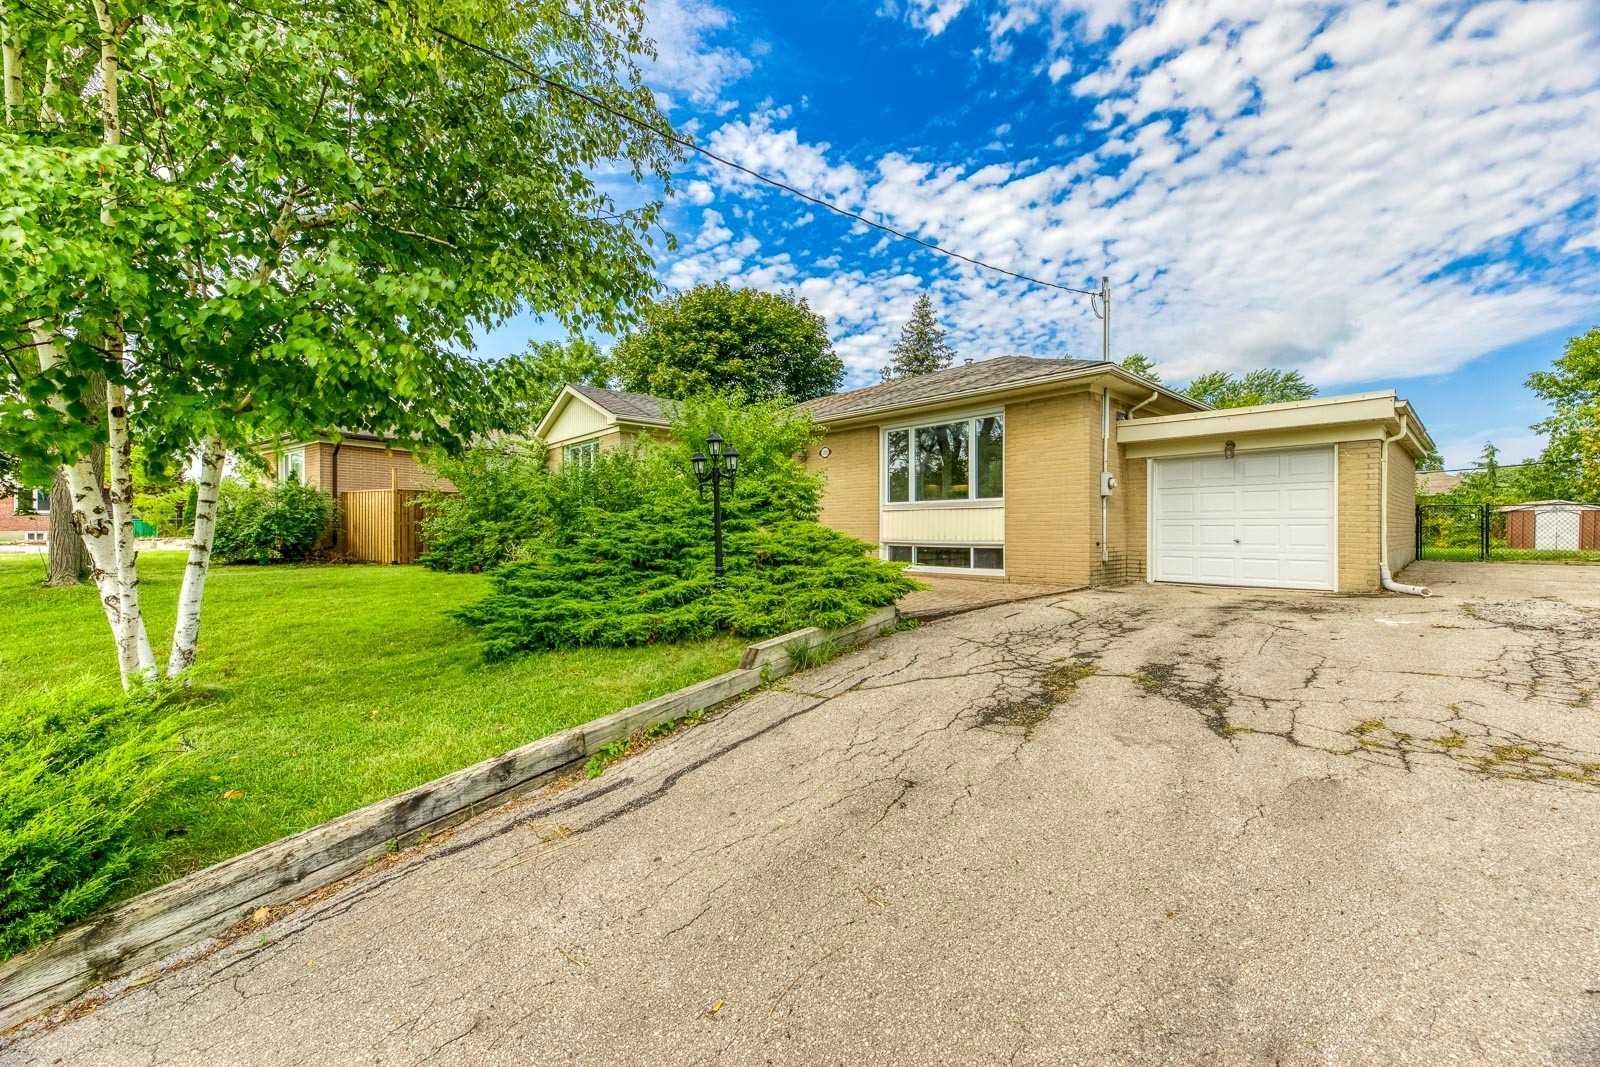 Detached house For Sale In Oakville - 1333 Sheldon Ave, Oakville, Ontario, Canada L6L2P9 , 3 Bedrooms Bedrooms, ,2 BathroomsBathrooms,Detached,For Sale,Sheldon